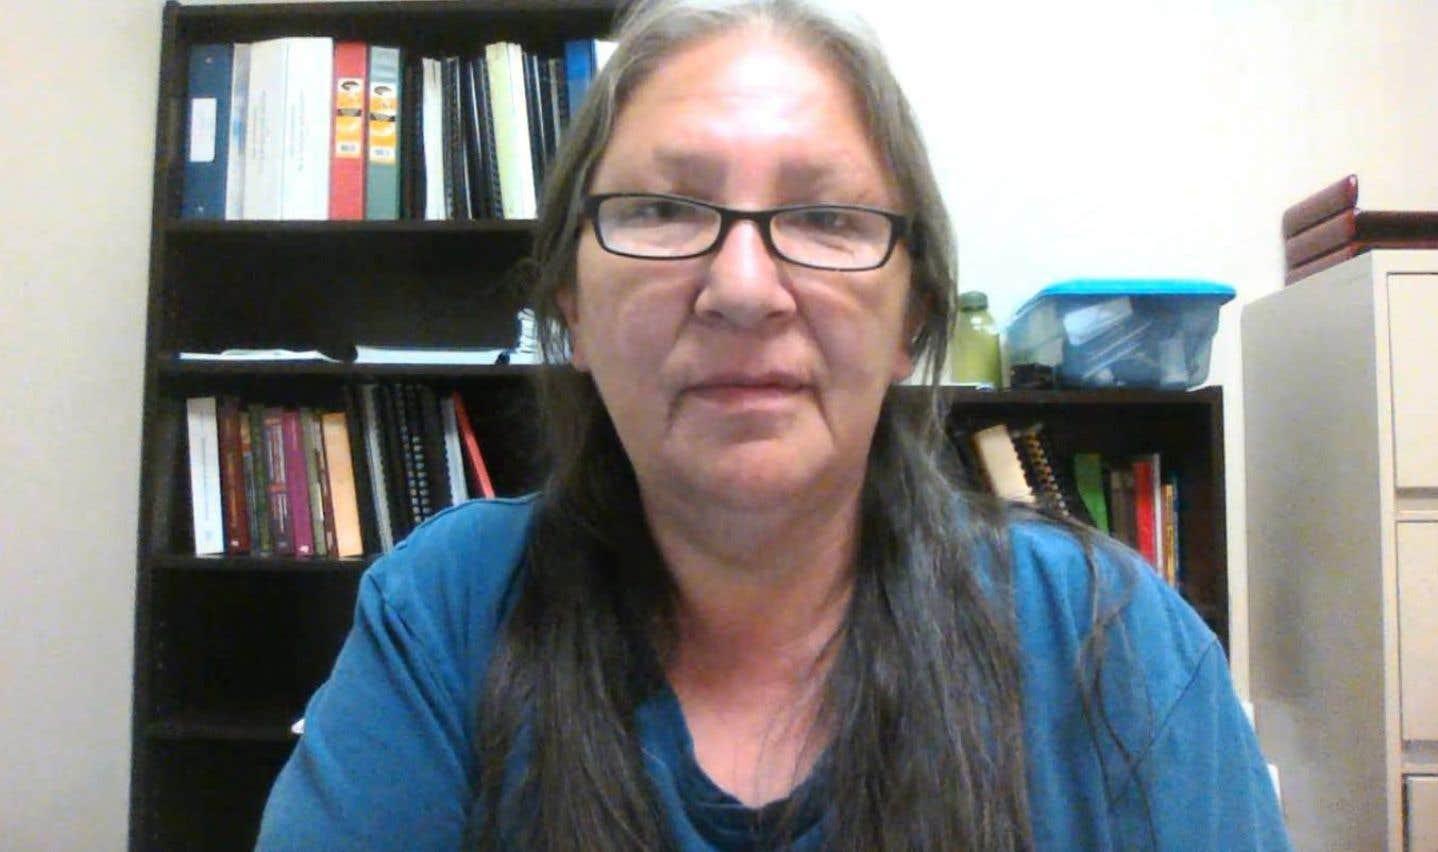 L'attikamek, la langue autochtone la plus vivante du Canada